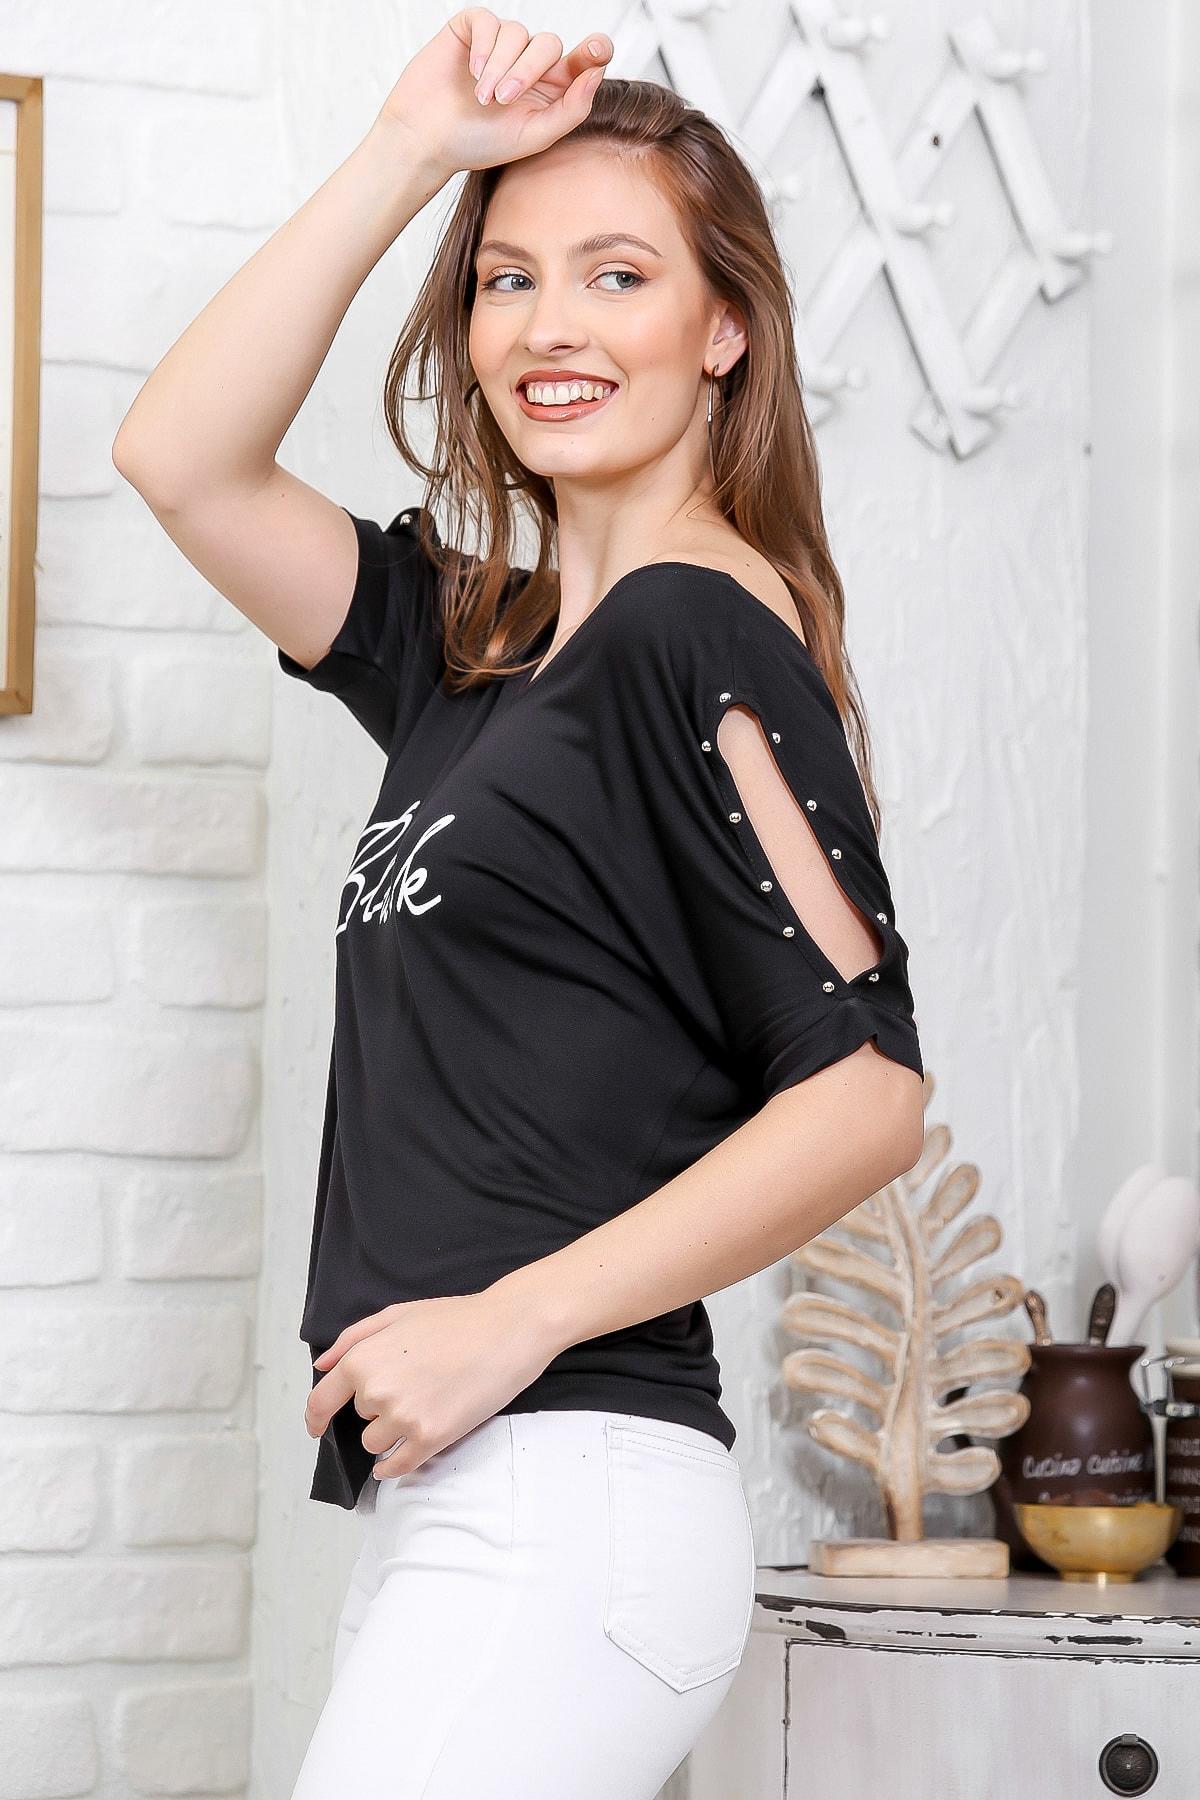 Chiccy Kadın Siyah Ön Arka V Yaka Omuz Pencereli Baskılı T-Shirt M10010300TS98278 2